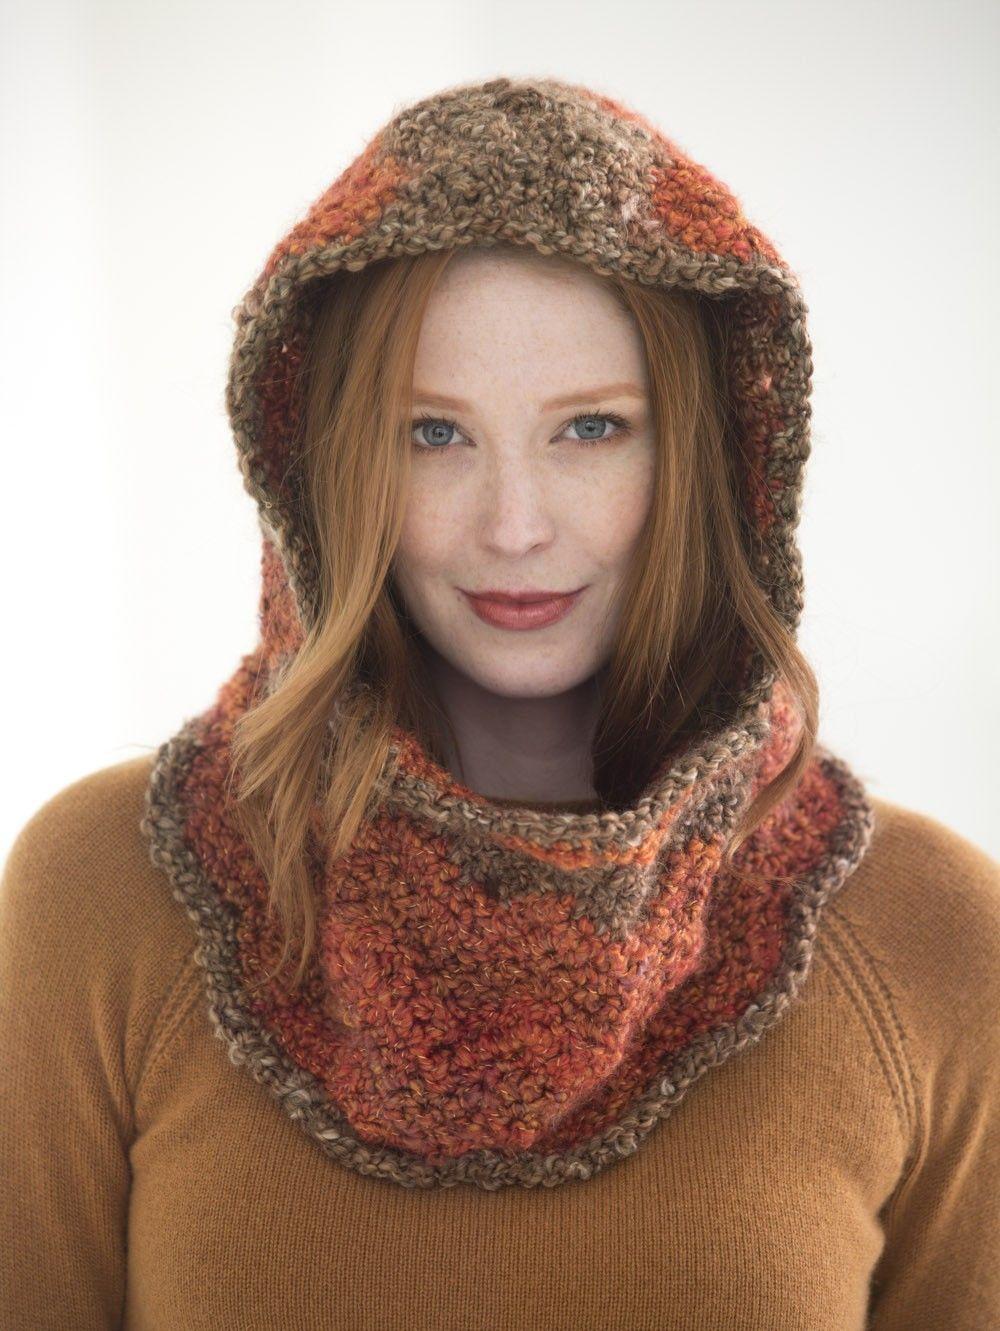 Ripped Hooded Cowl (Crochet) FREE PATTERN | Cowl | Pinterest ...